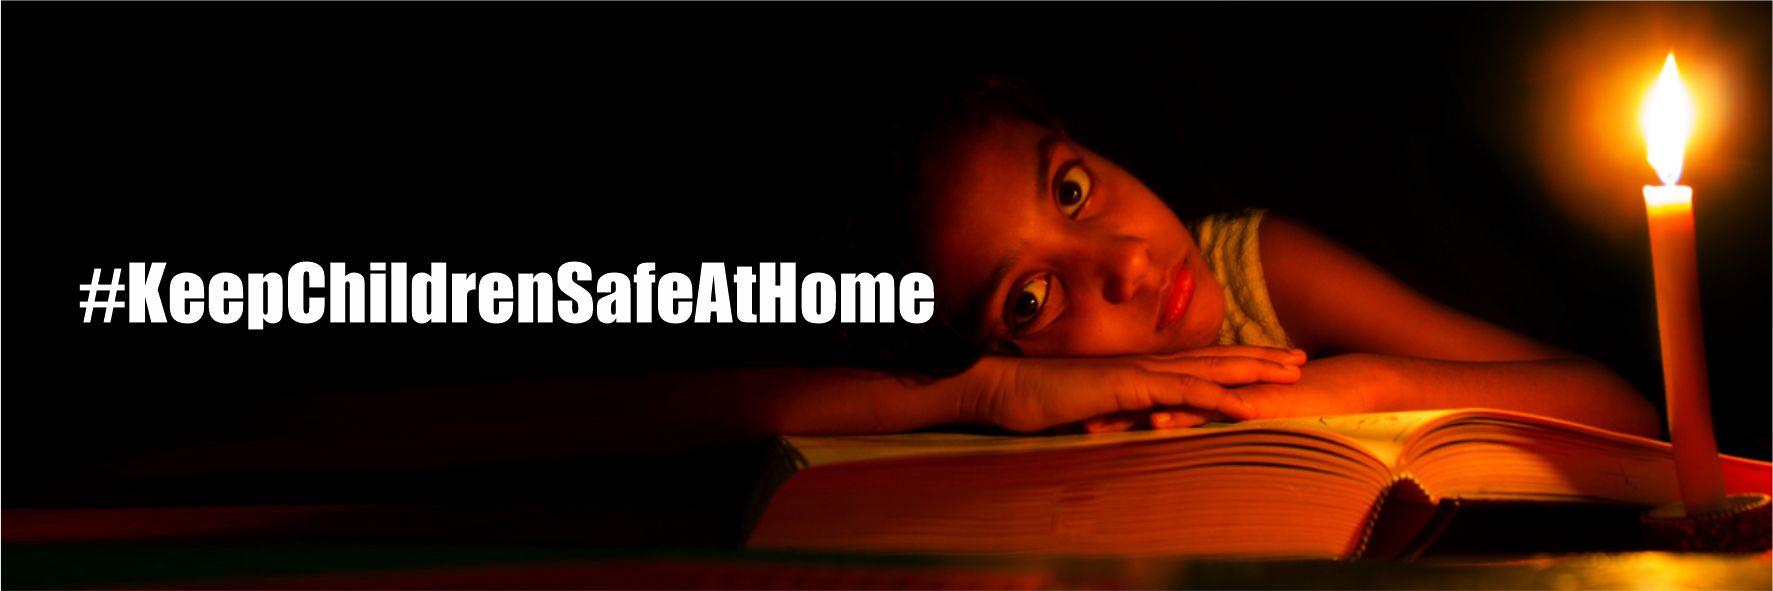 keep children safe at home